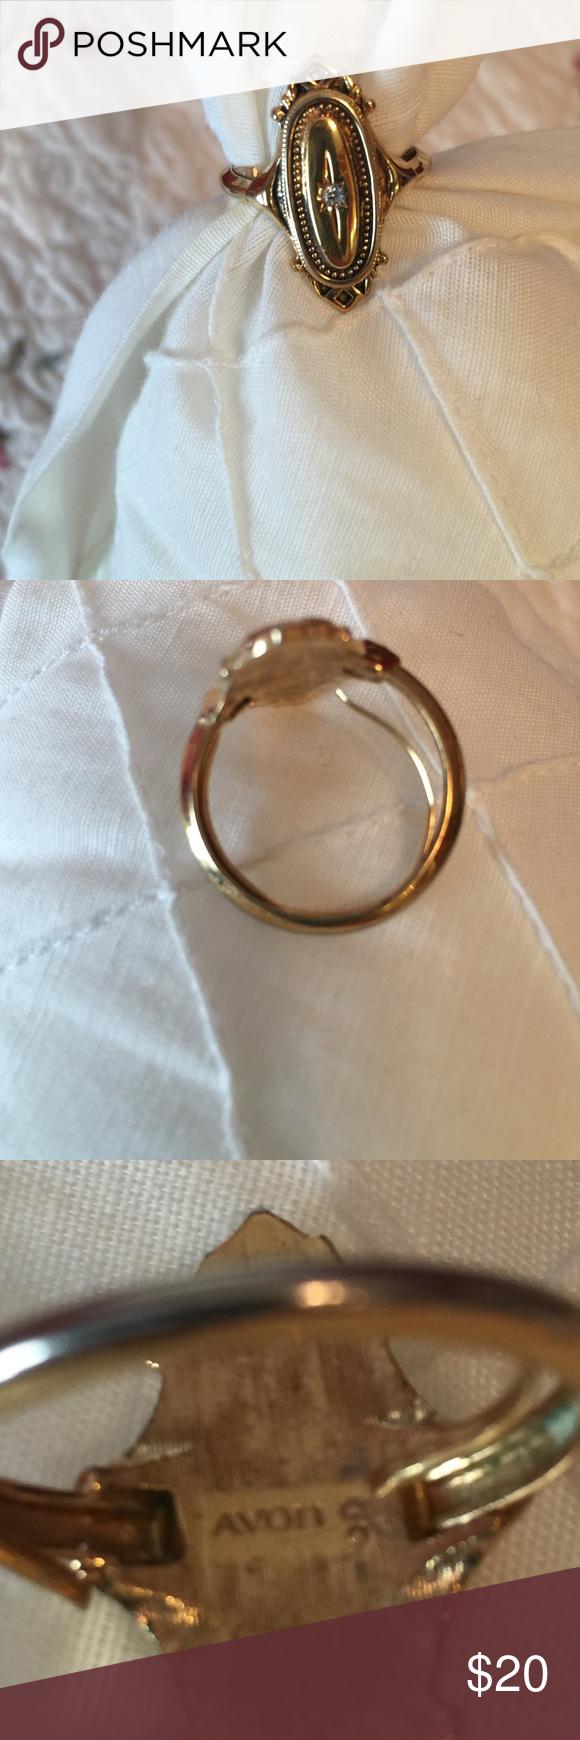 Vintage Avon Ring Avon jewelry rings, Avon rings